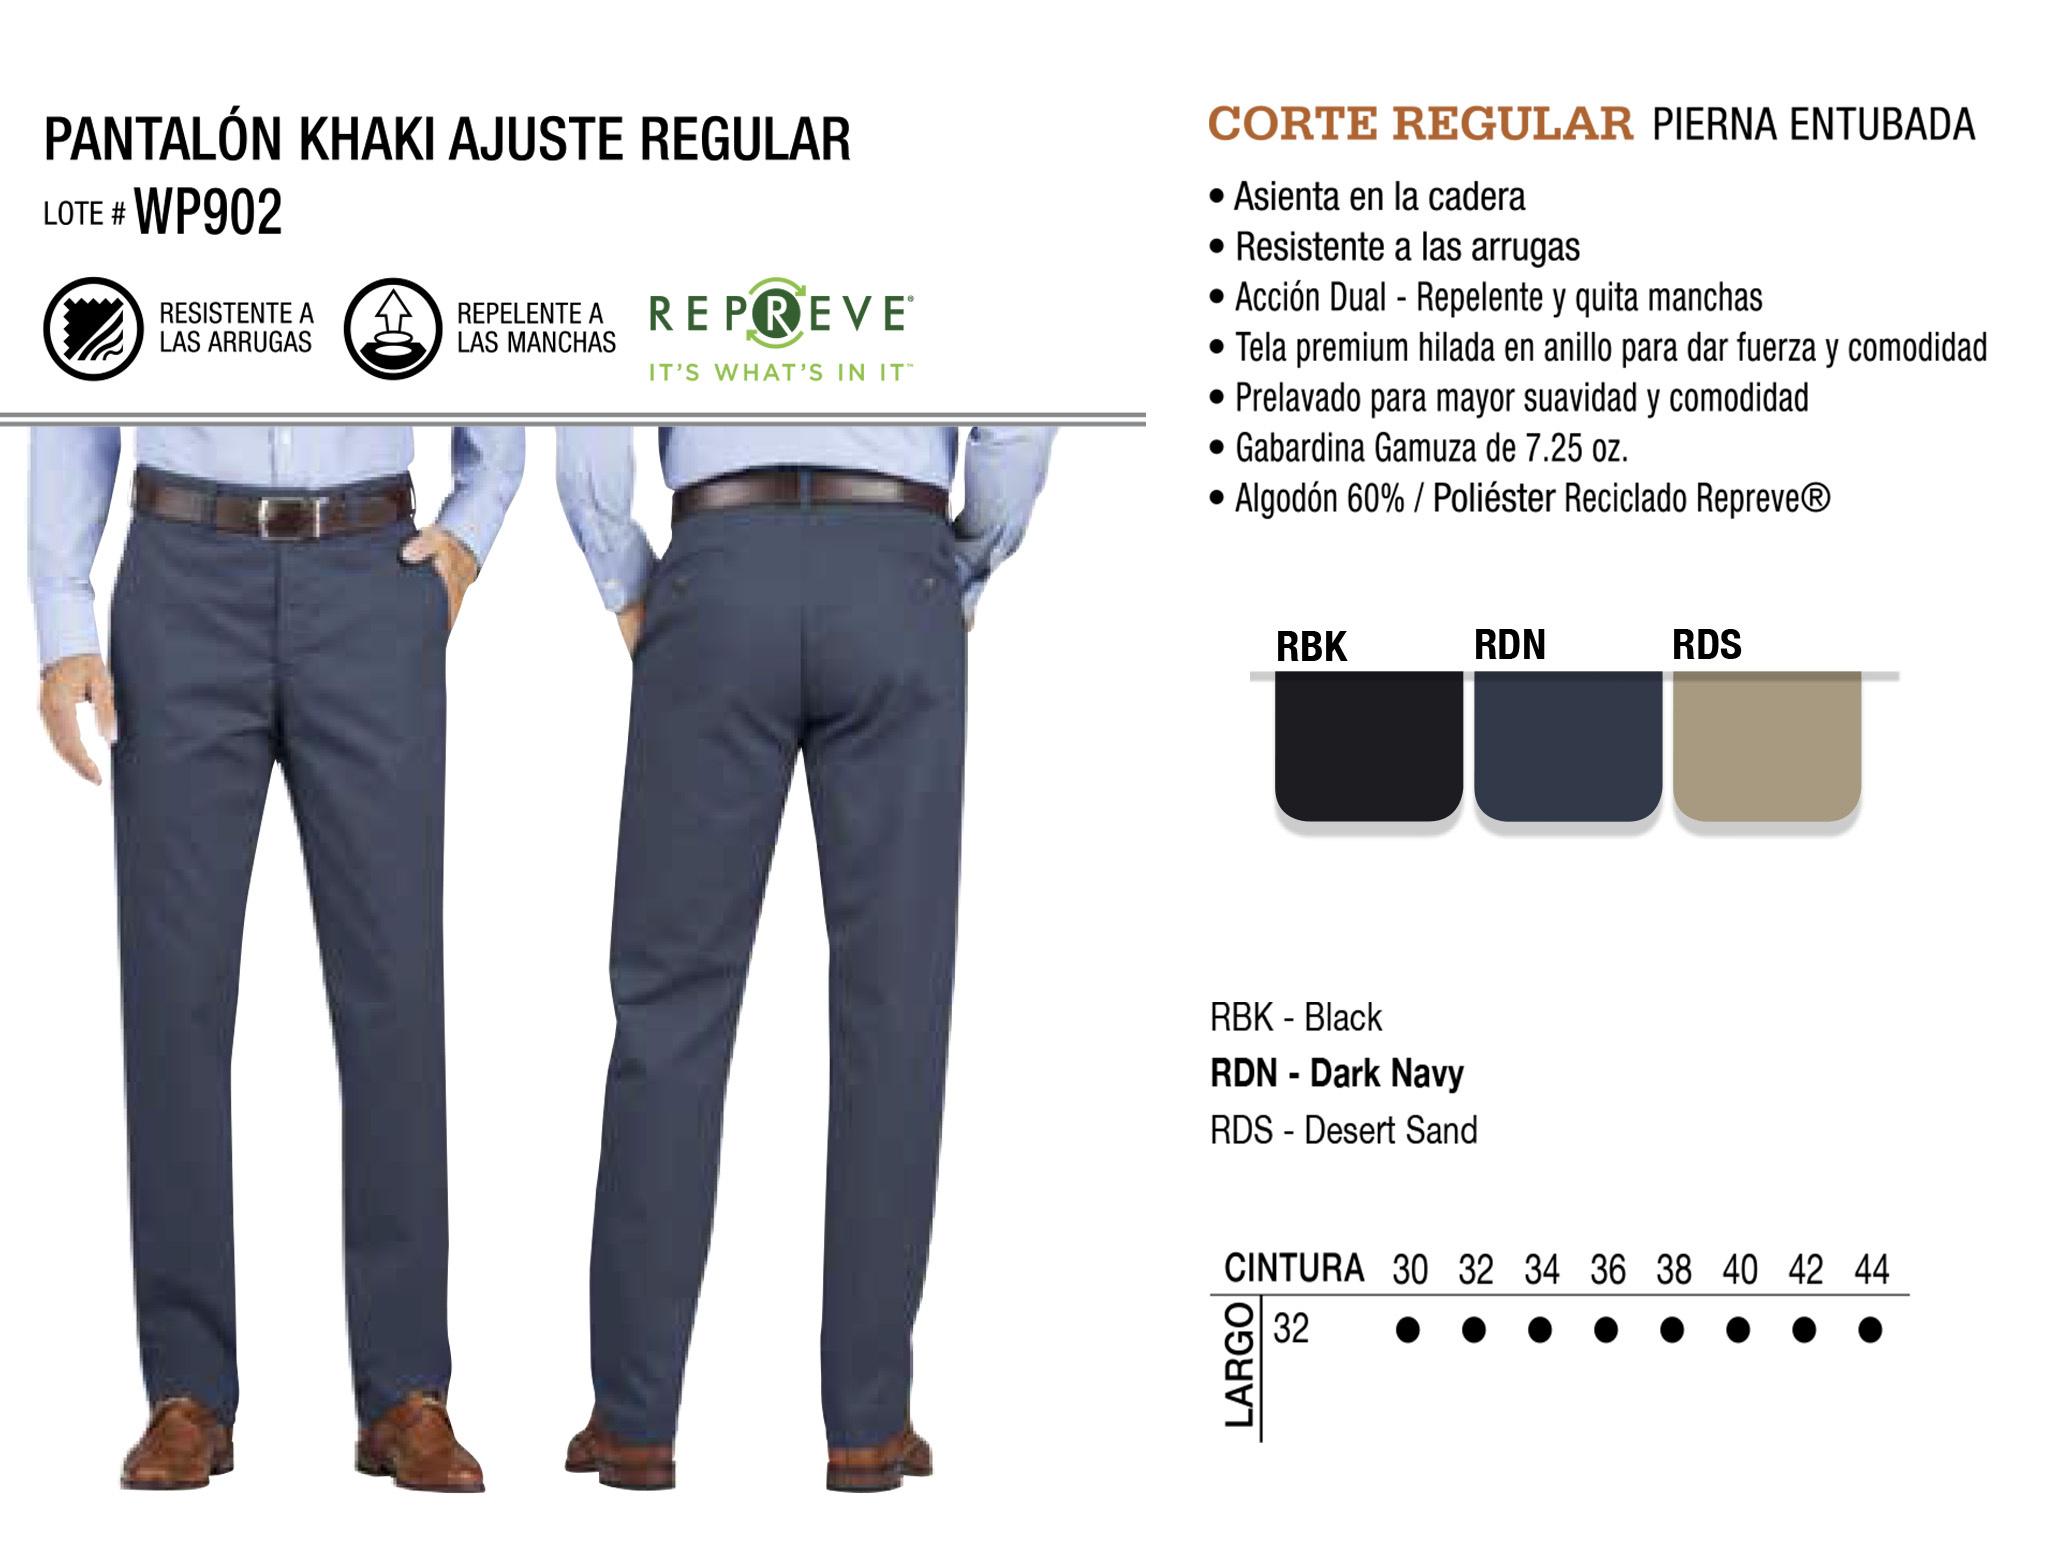 Pantalón Khaki Ajuste Regular. Corte Regular. WP902.